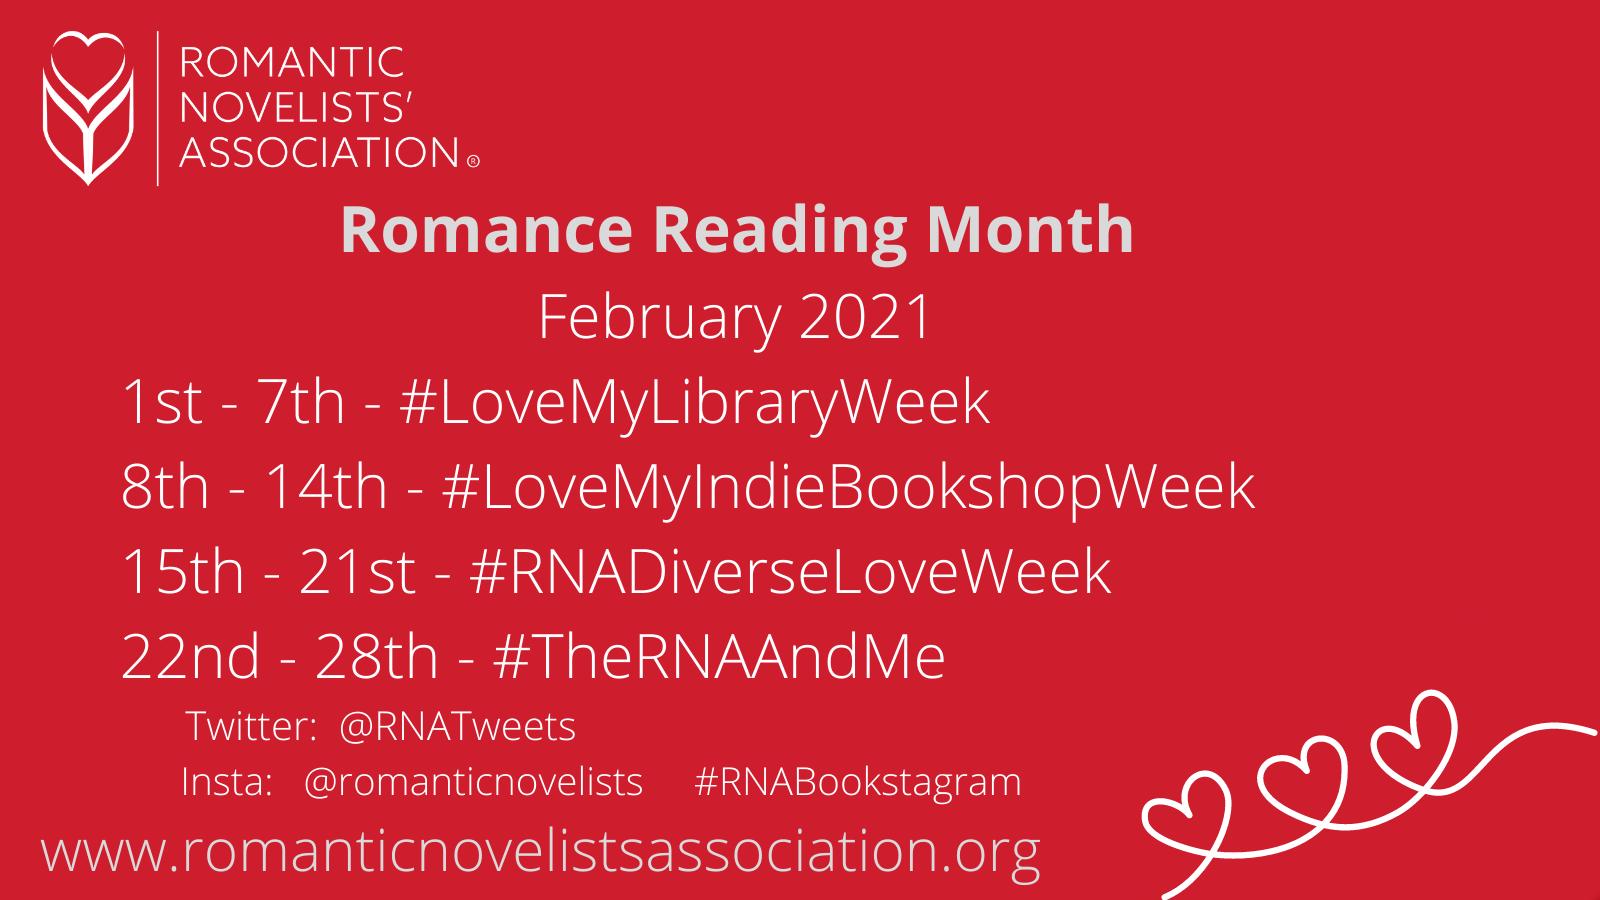 Romance Reading Month 2021